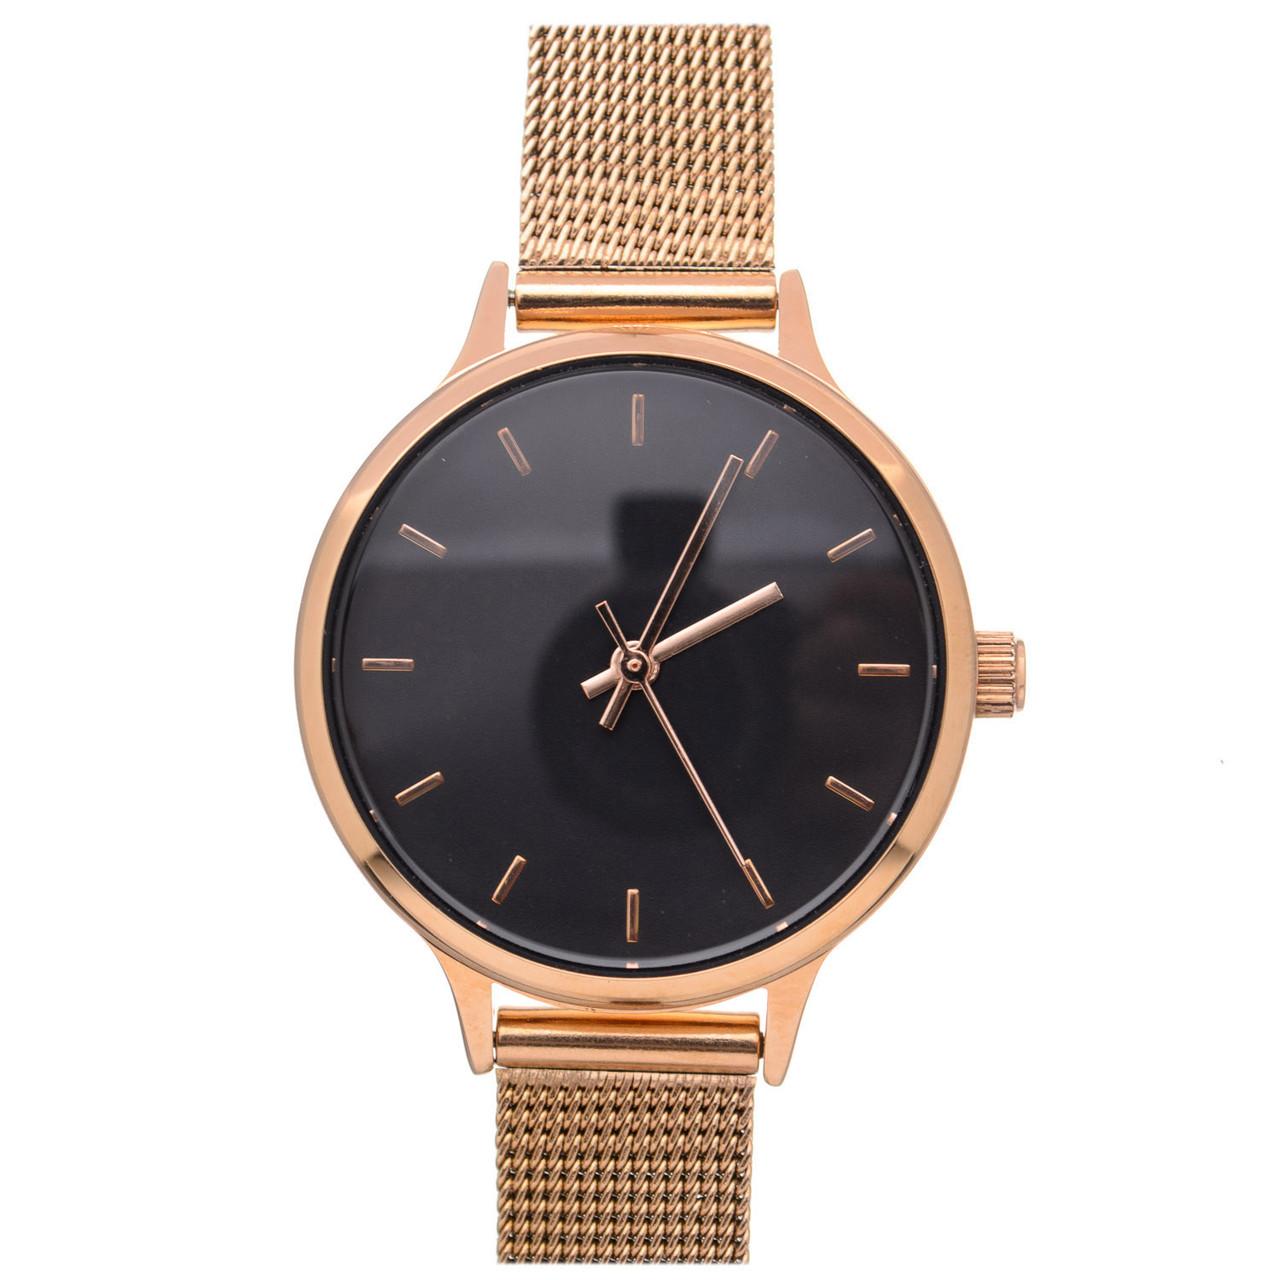 Жіночий годинник Even&Odd 17-0092 Gold